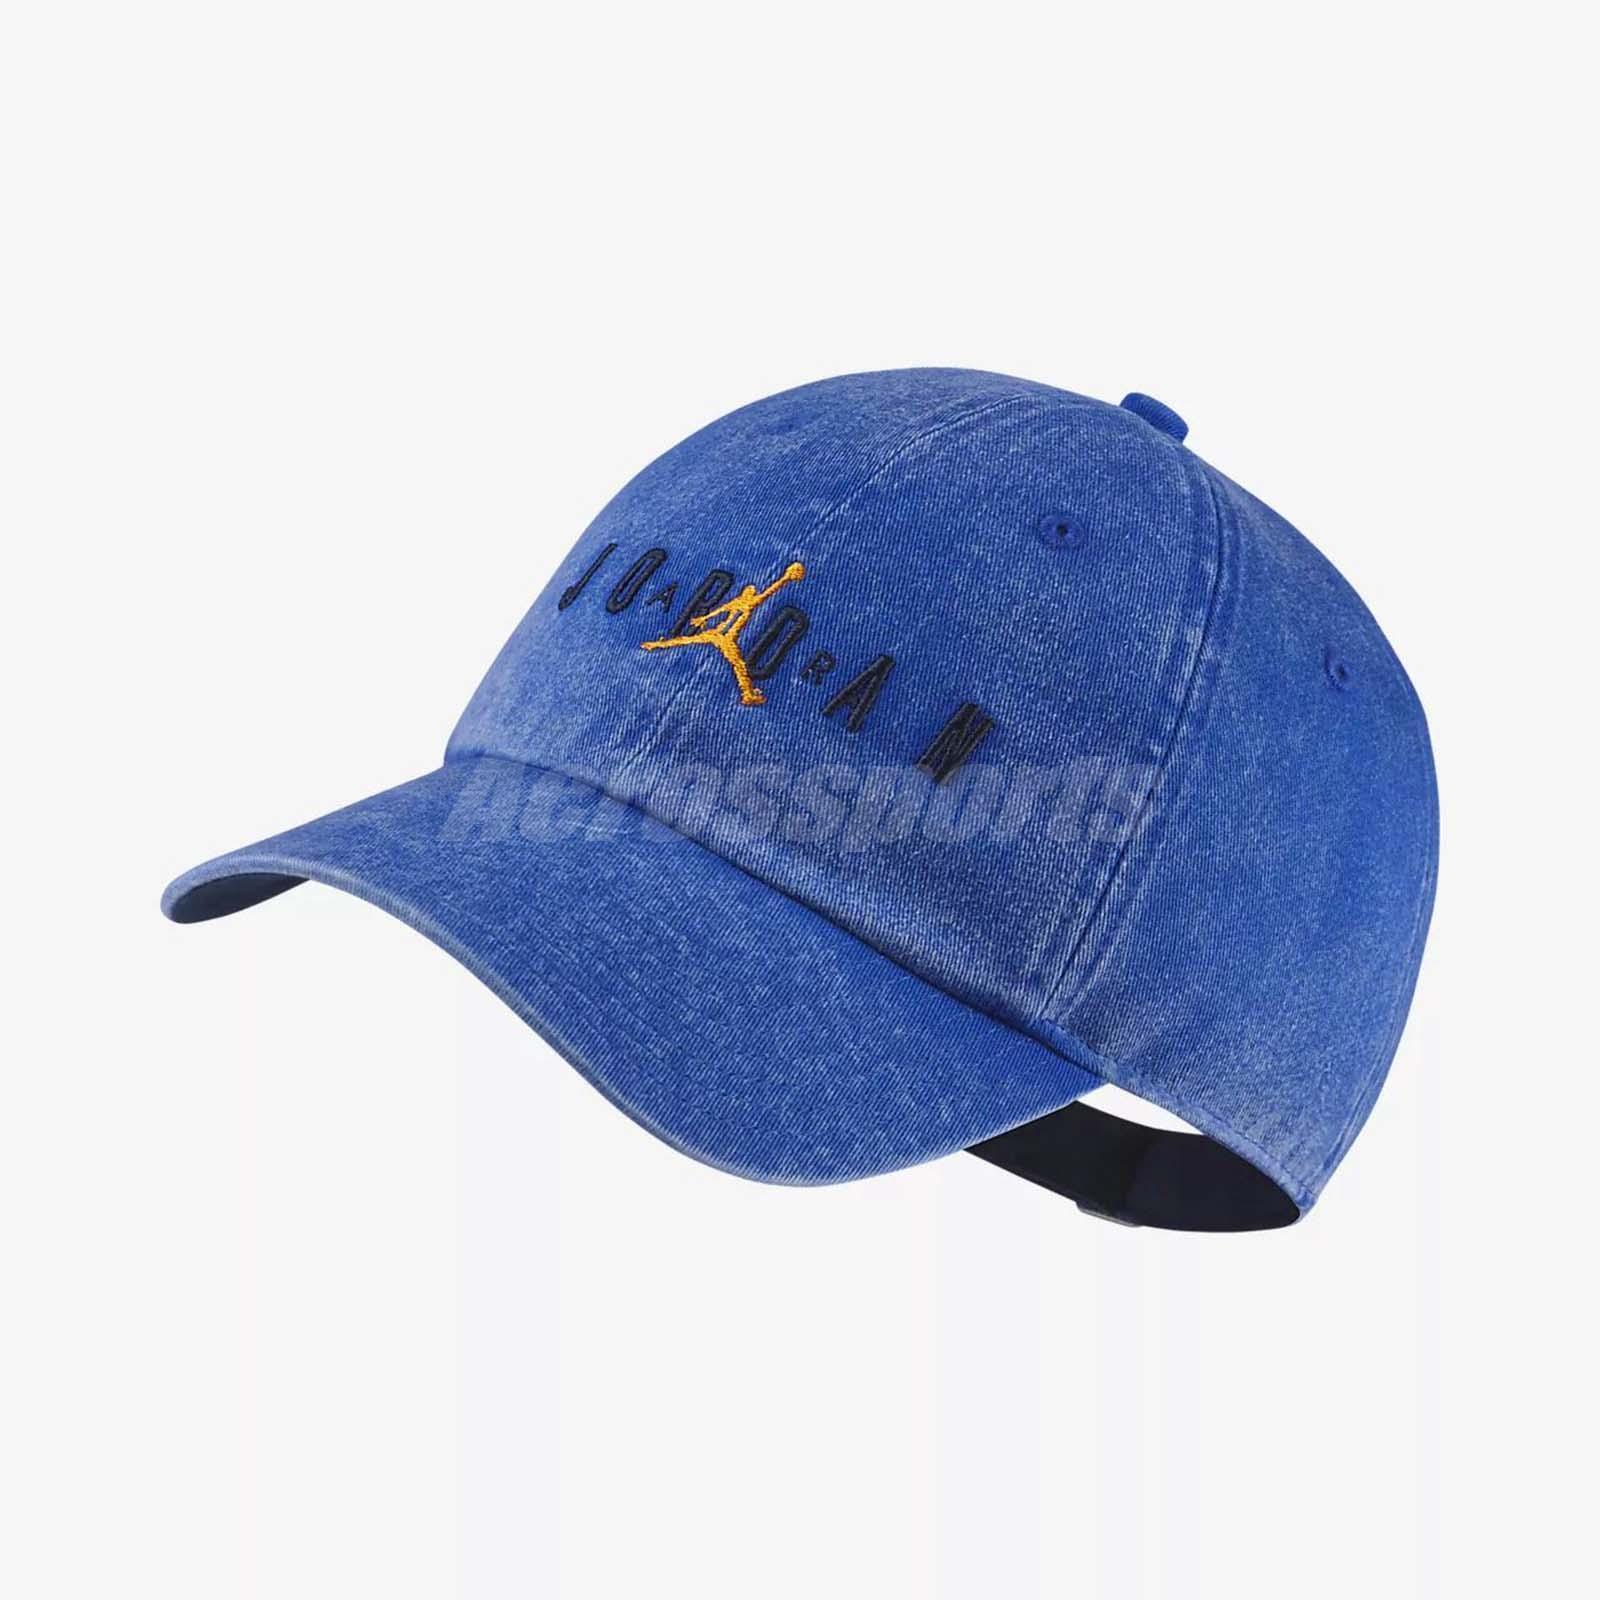 064f58de589 ... order nike jordan air heritage jumpman adjustable cap air jordan hat  h86 washed blue aa1306 405 ...